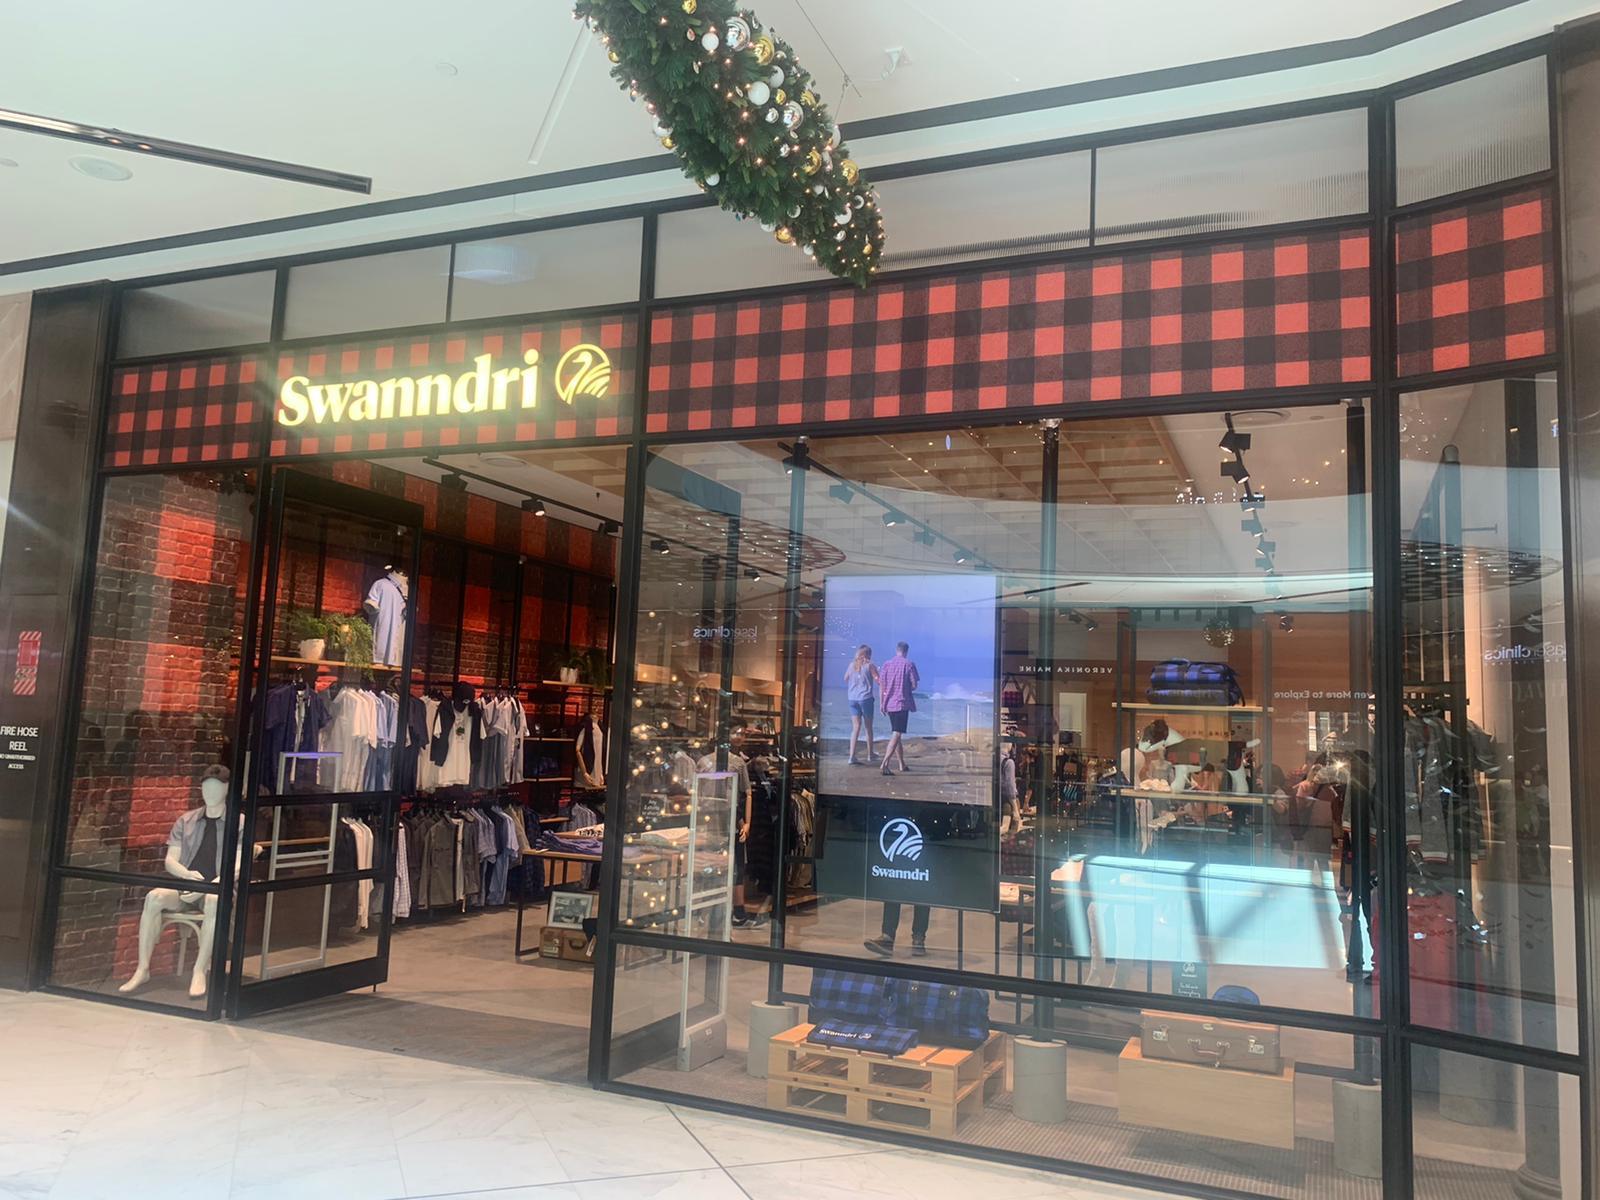 Swanndri Shop frontage